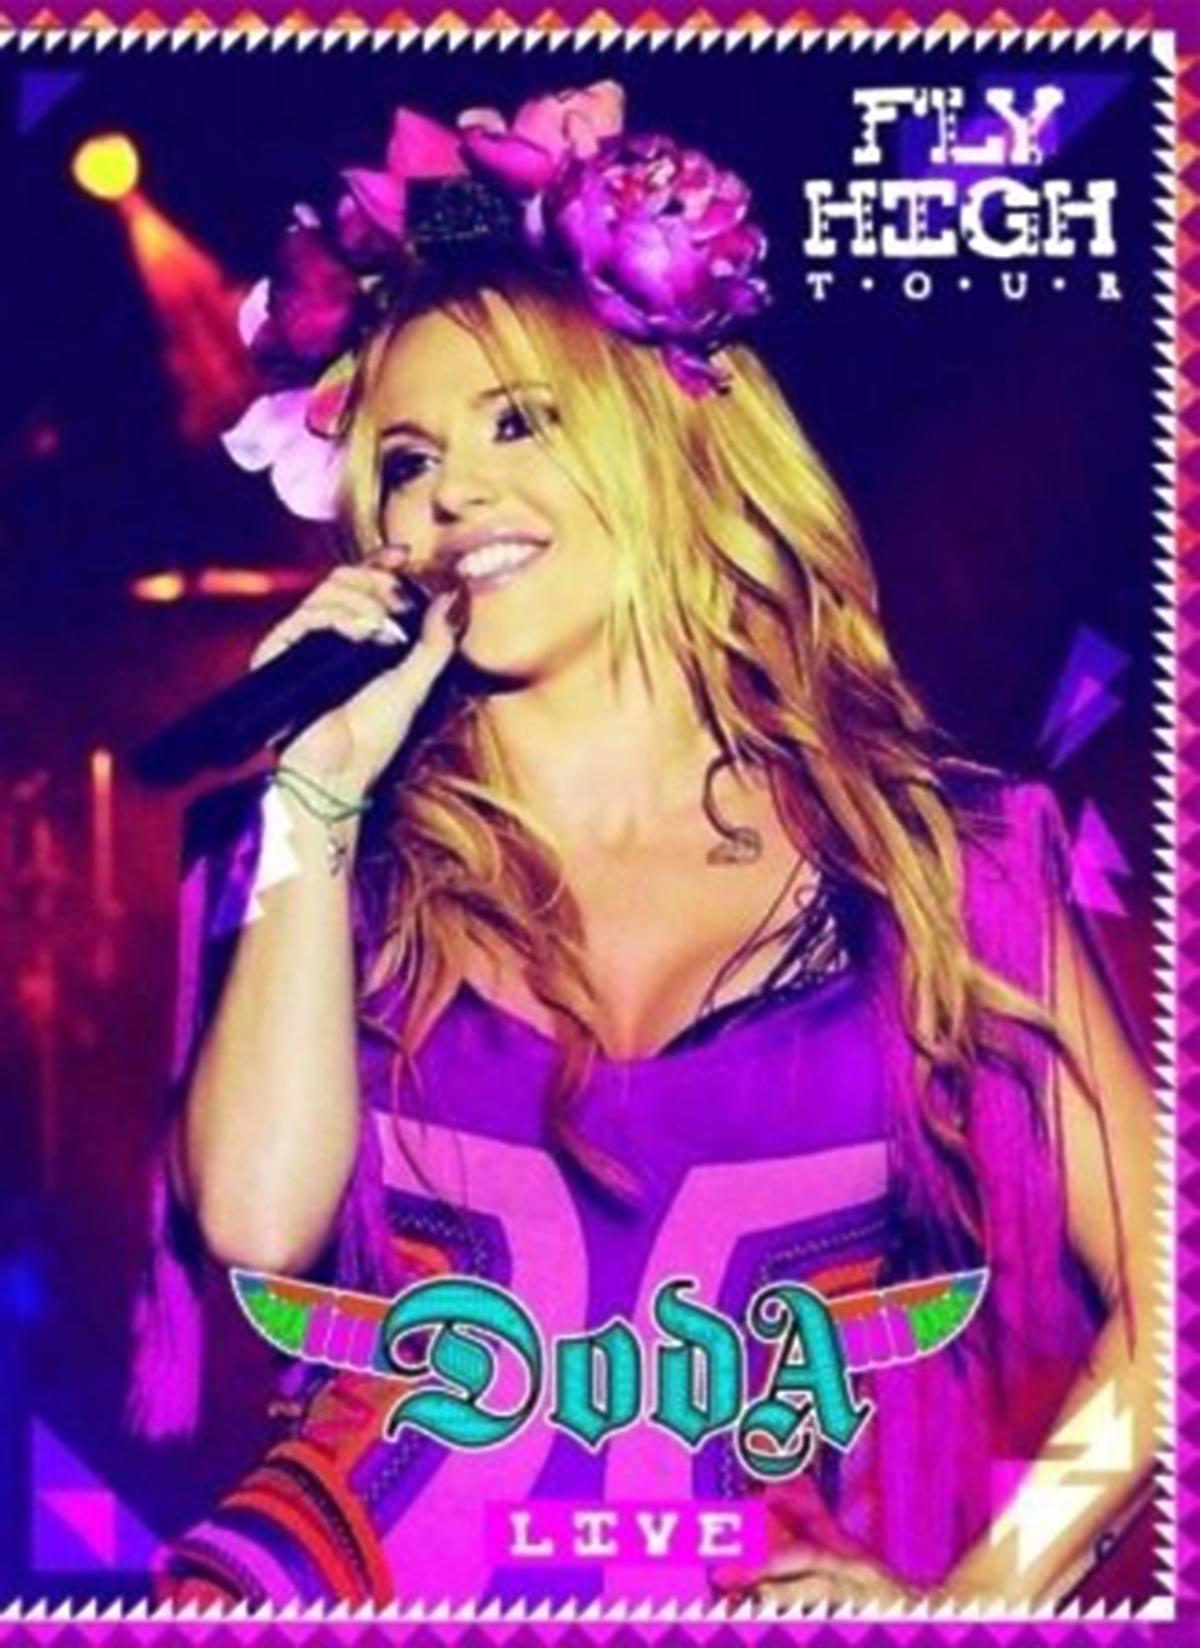 Doda Fly High Tour DVD. Okładka DVD Dody. Doda Fly High Tour DVD okładka